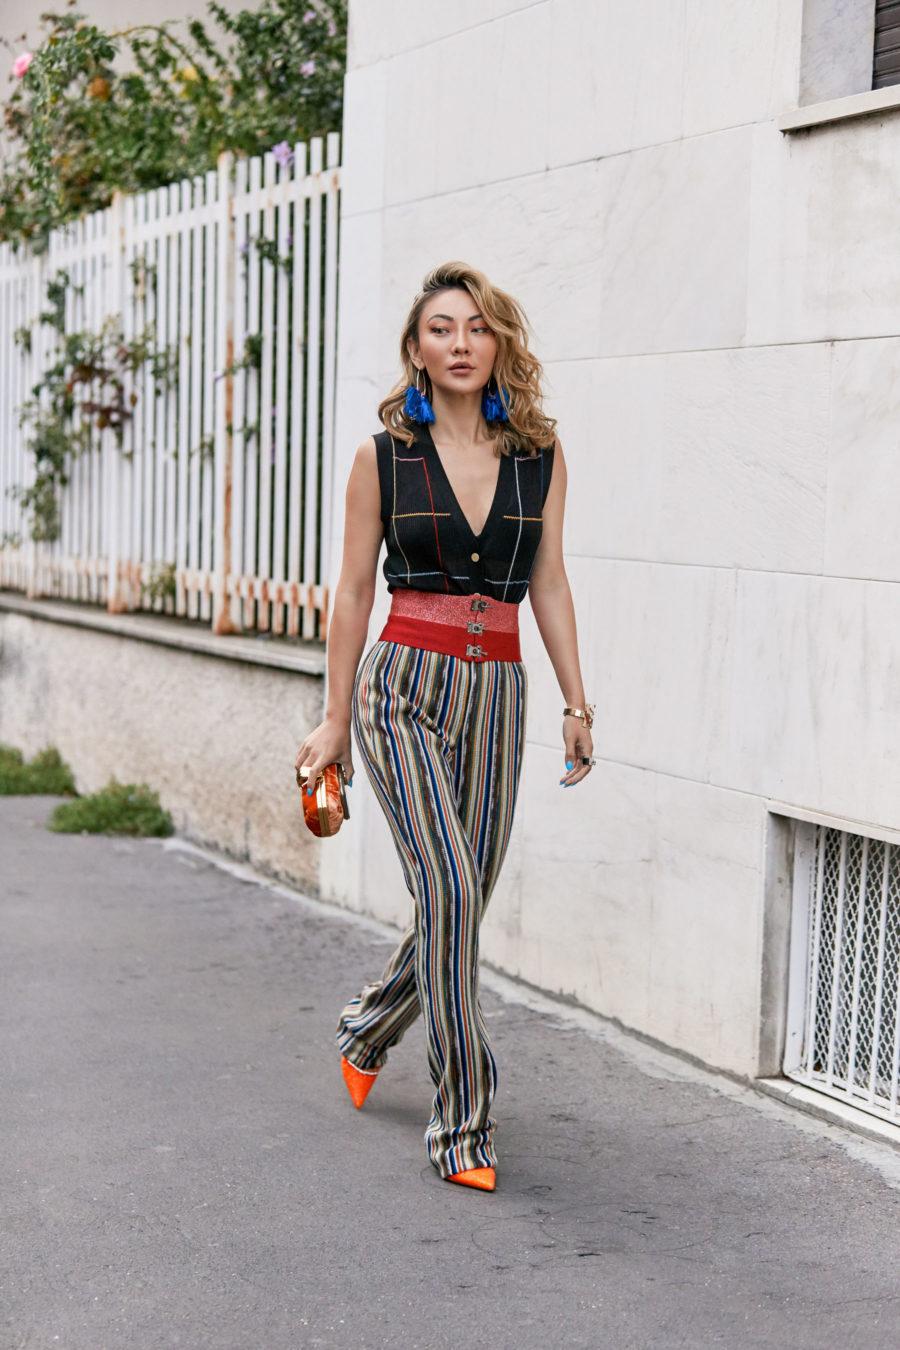 fashion blogger jessica wang wears missoni // Notjessfashion.com